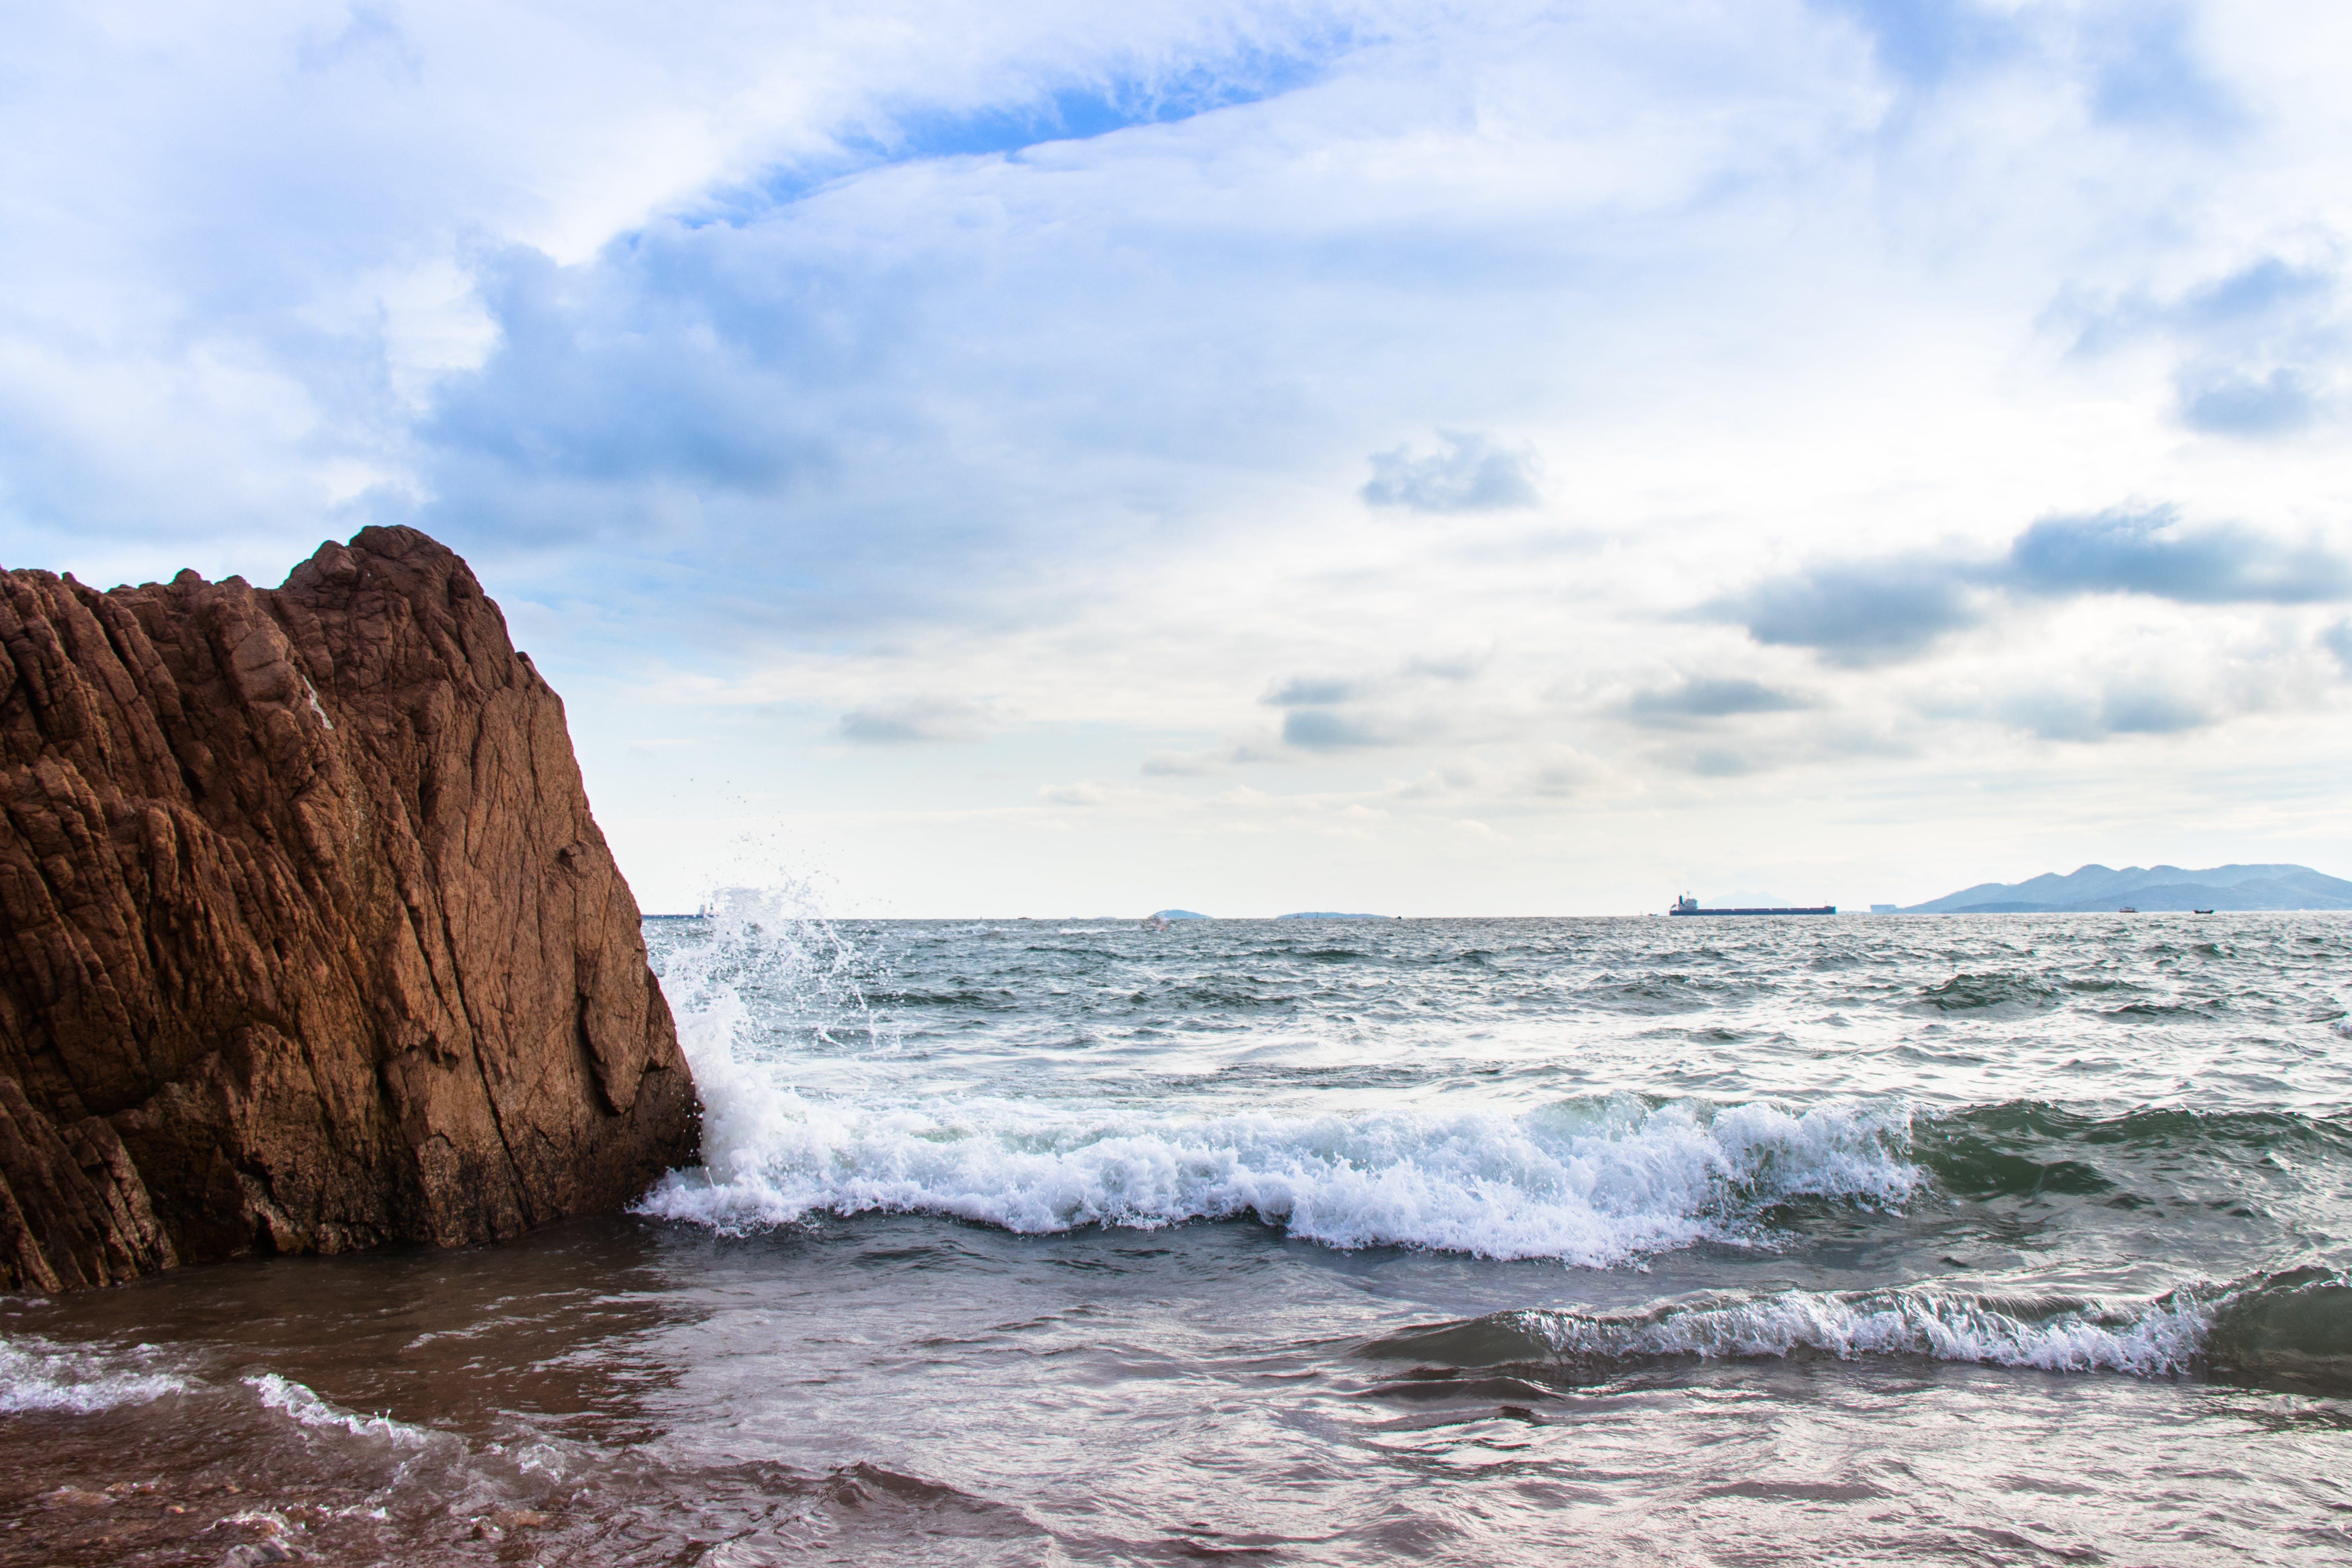 Sea Waves Splashing on Shore and Rock Island